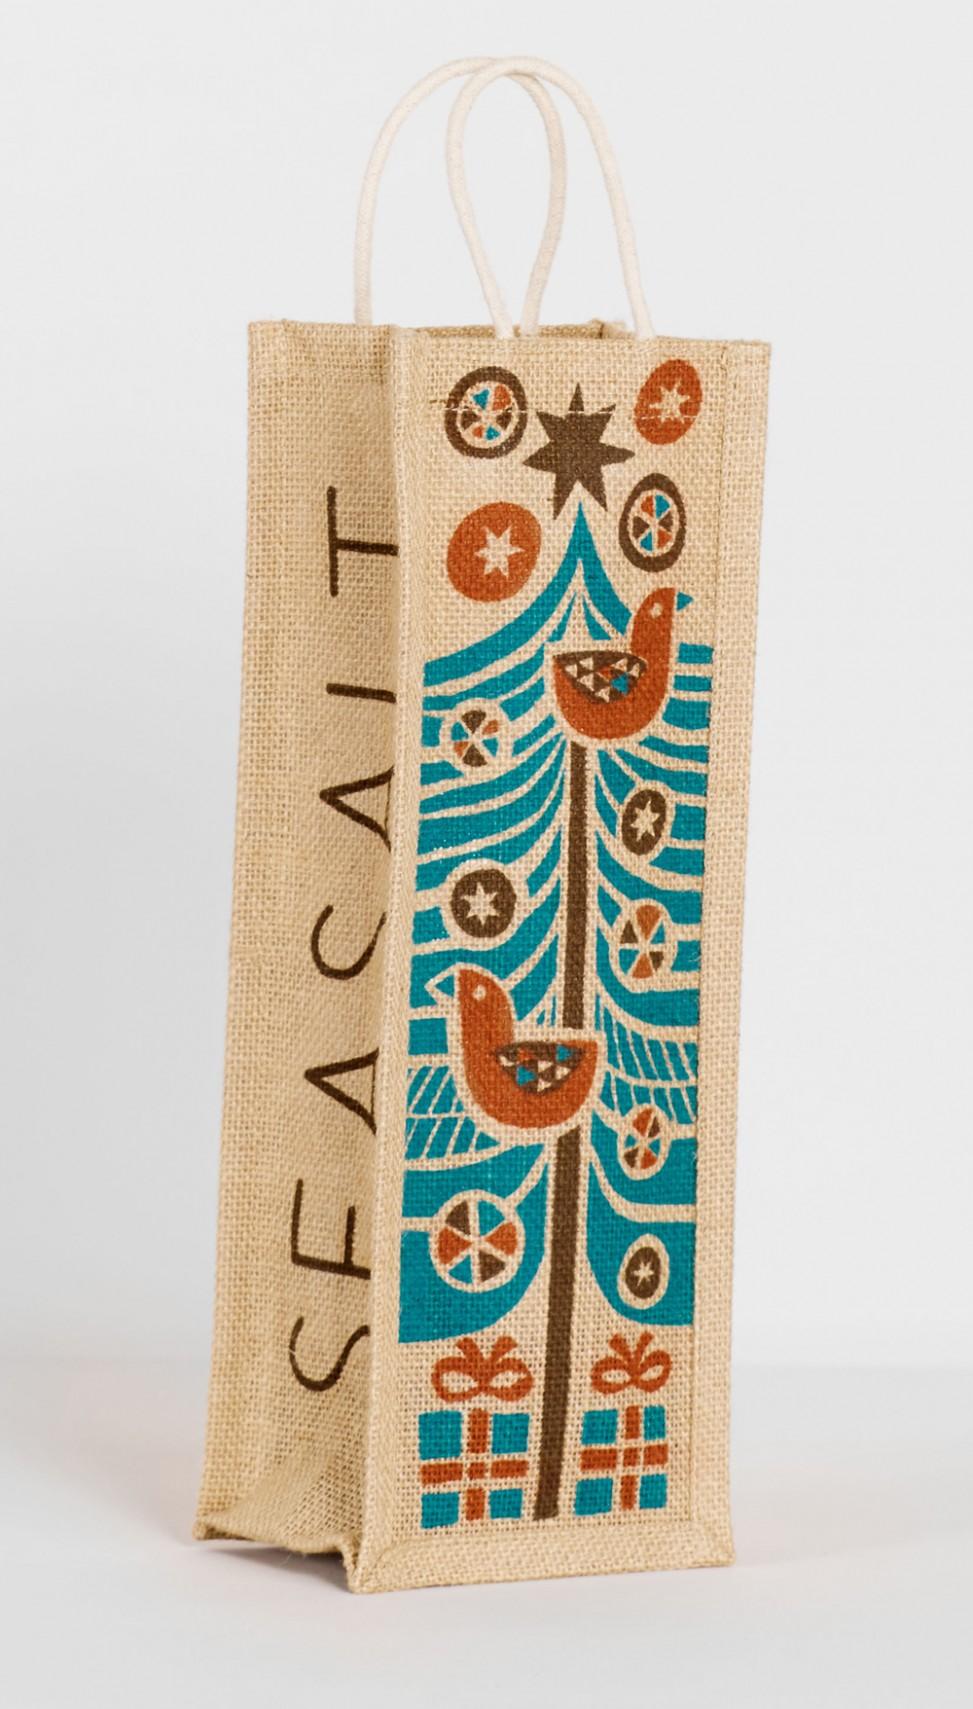 Wine bottle jute bag with folk art skandi style Christmas tree print by Matt Kohnson for Seasalt Cornwall